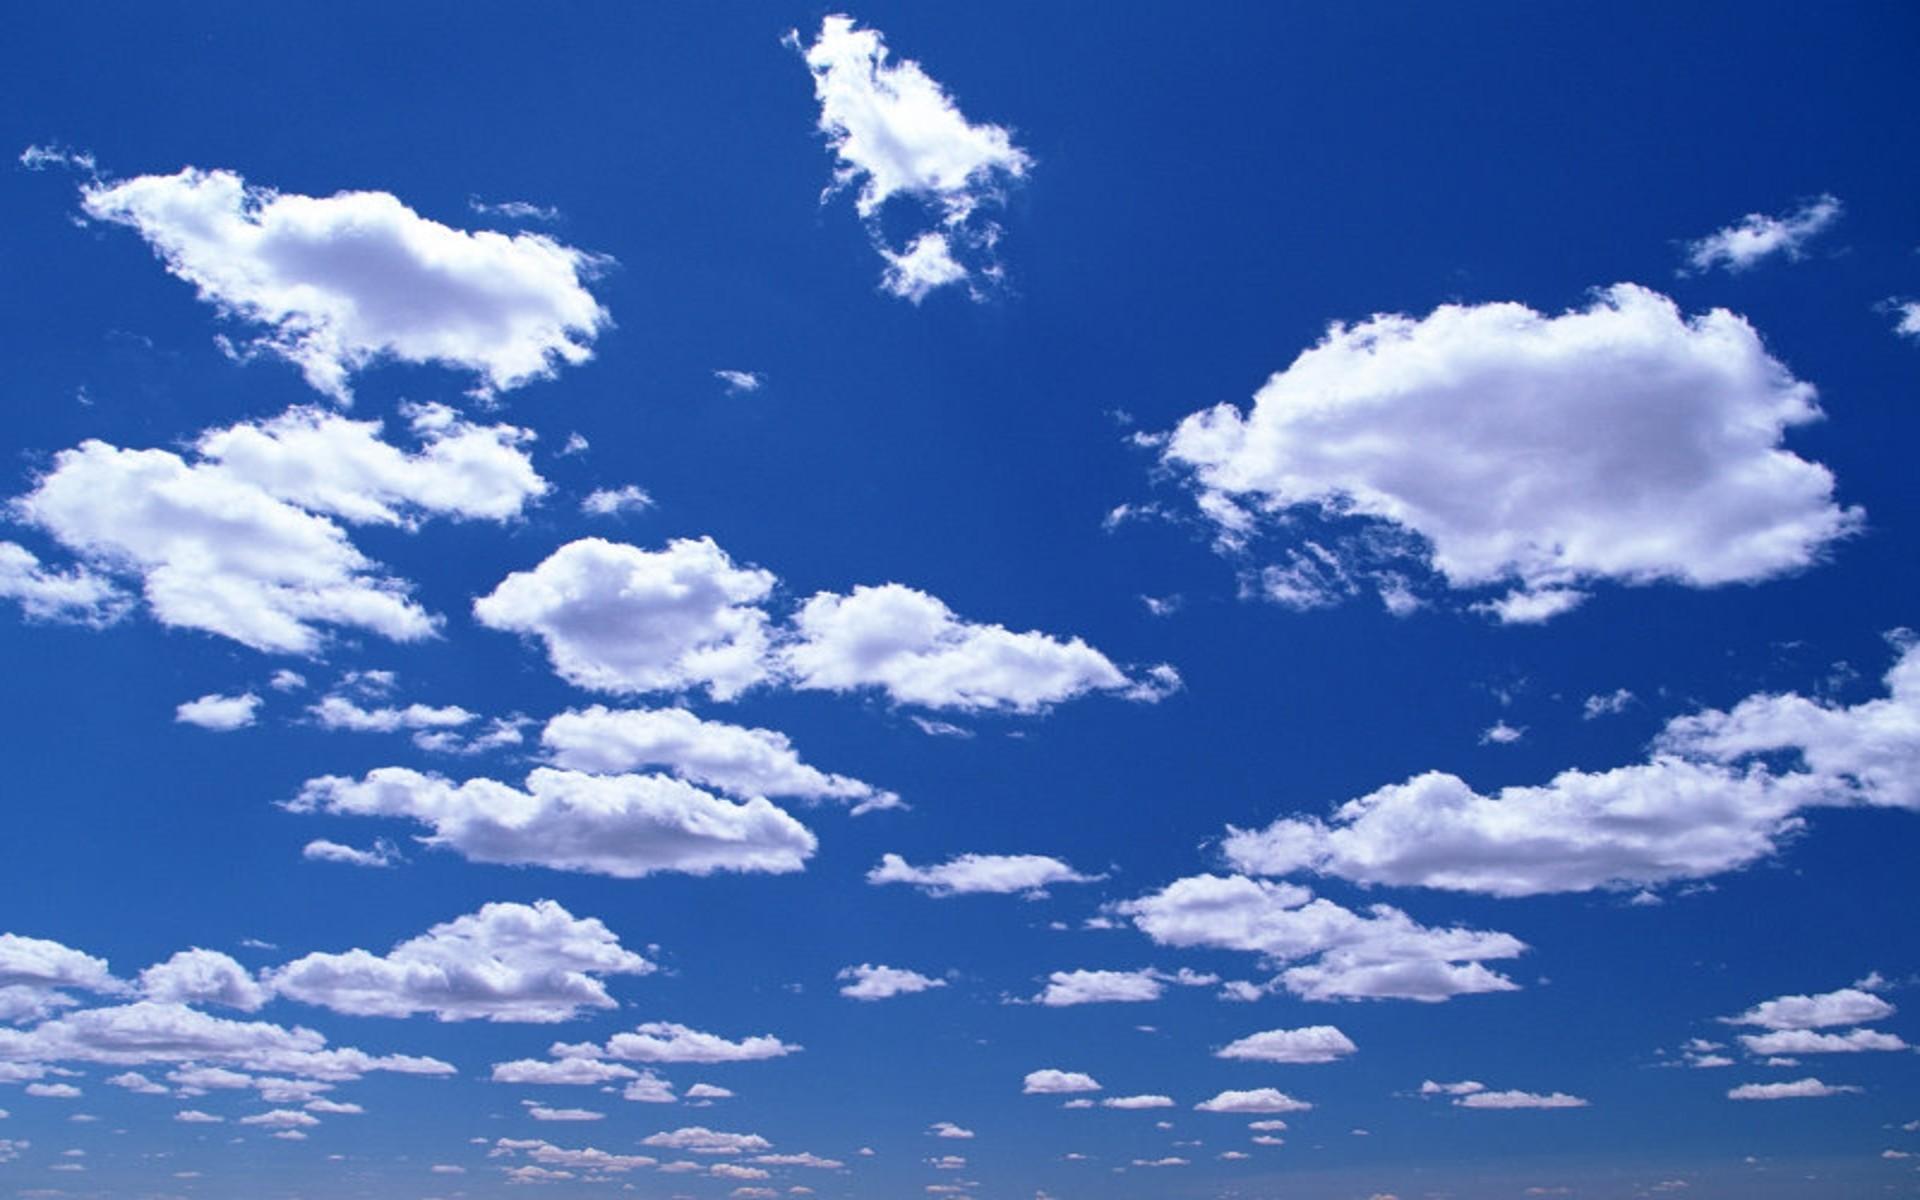 Clouds Wallpaper Hd